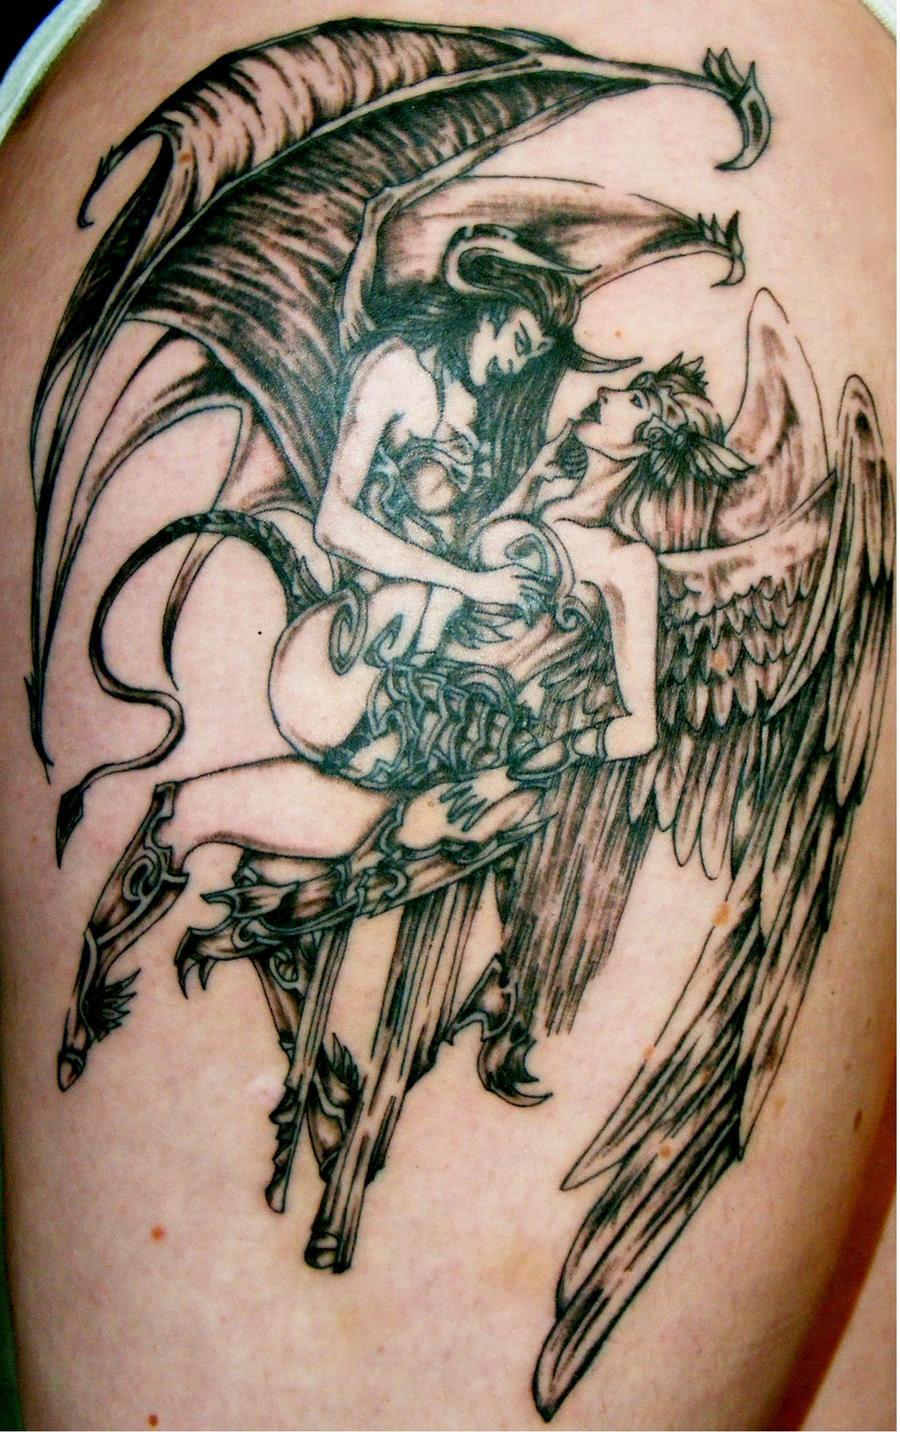 Tatos Me Popular Tattoo Design Angel Vs Demon